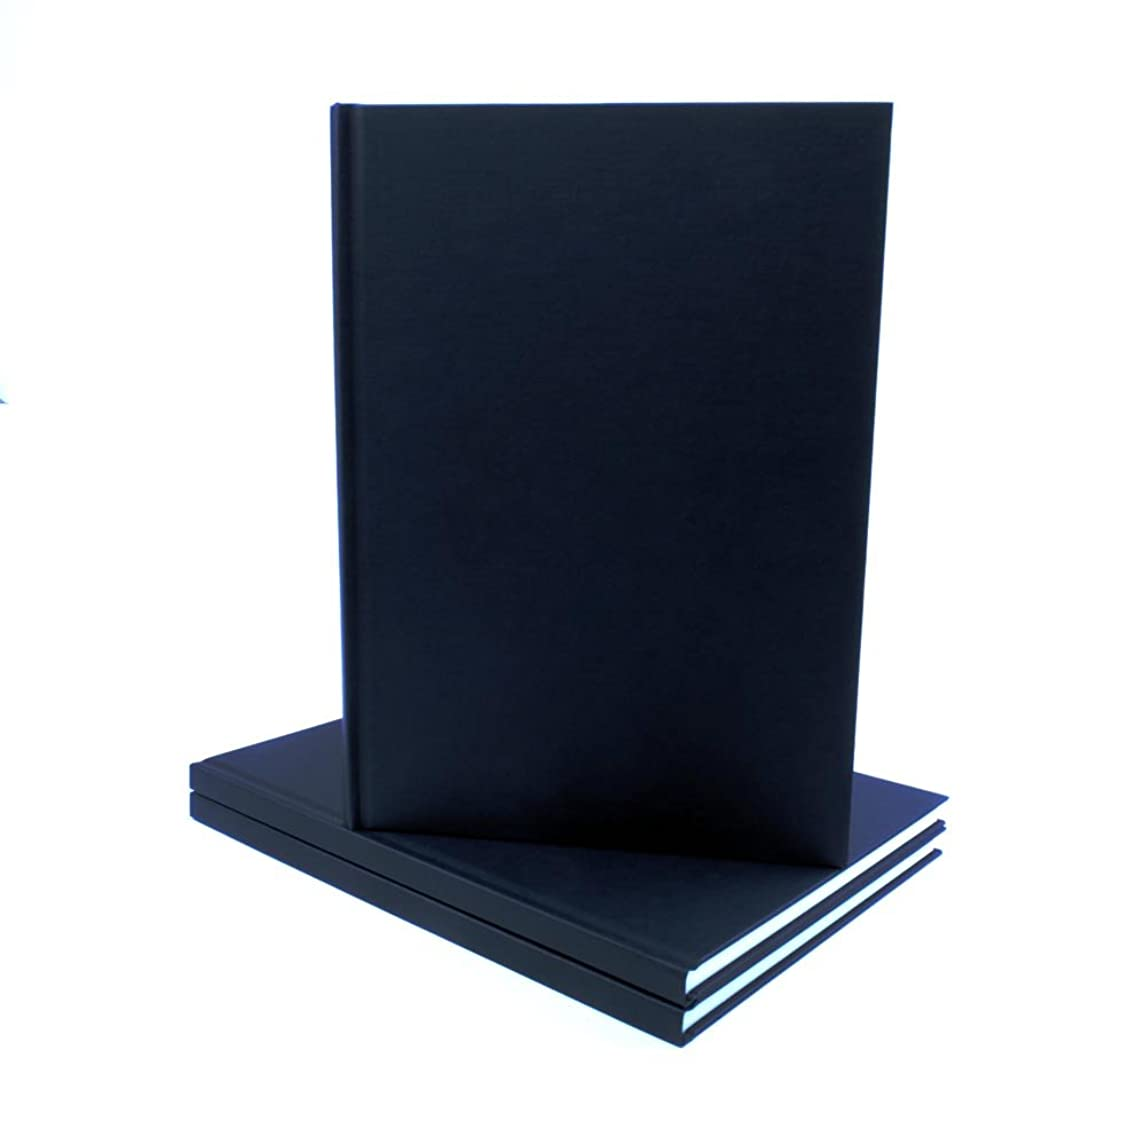 SEAWHITE Black Cloth Hardback Artists Sketchbook 140gsm Portrait A4-210x297mm